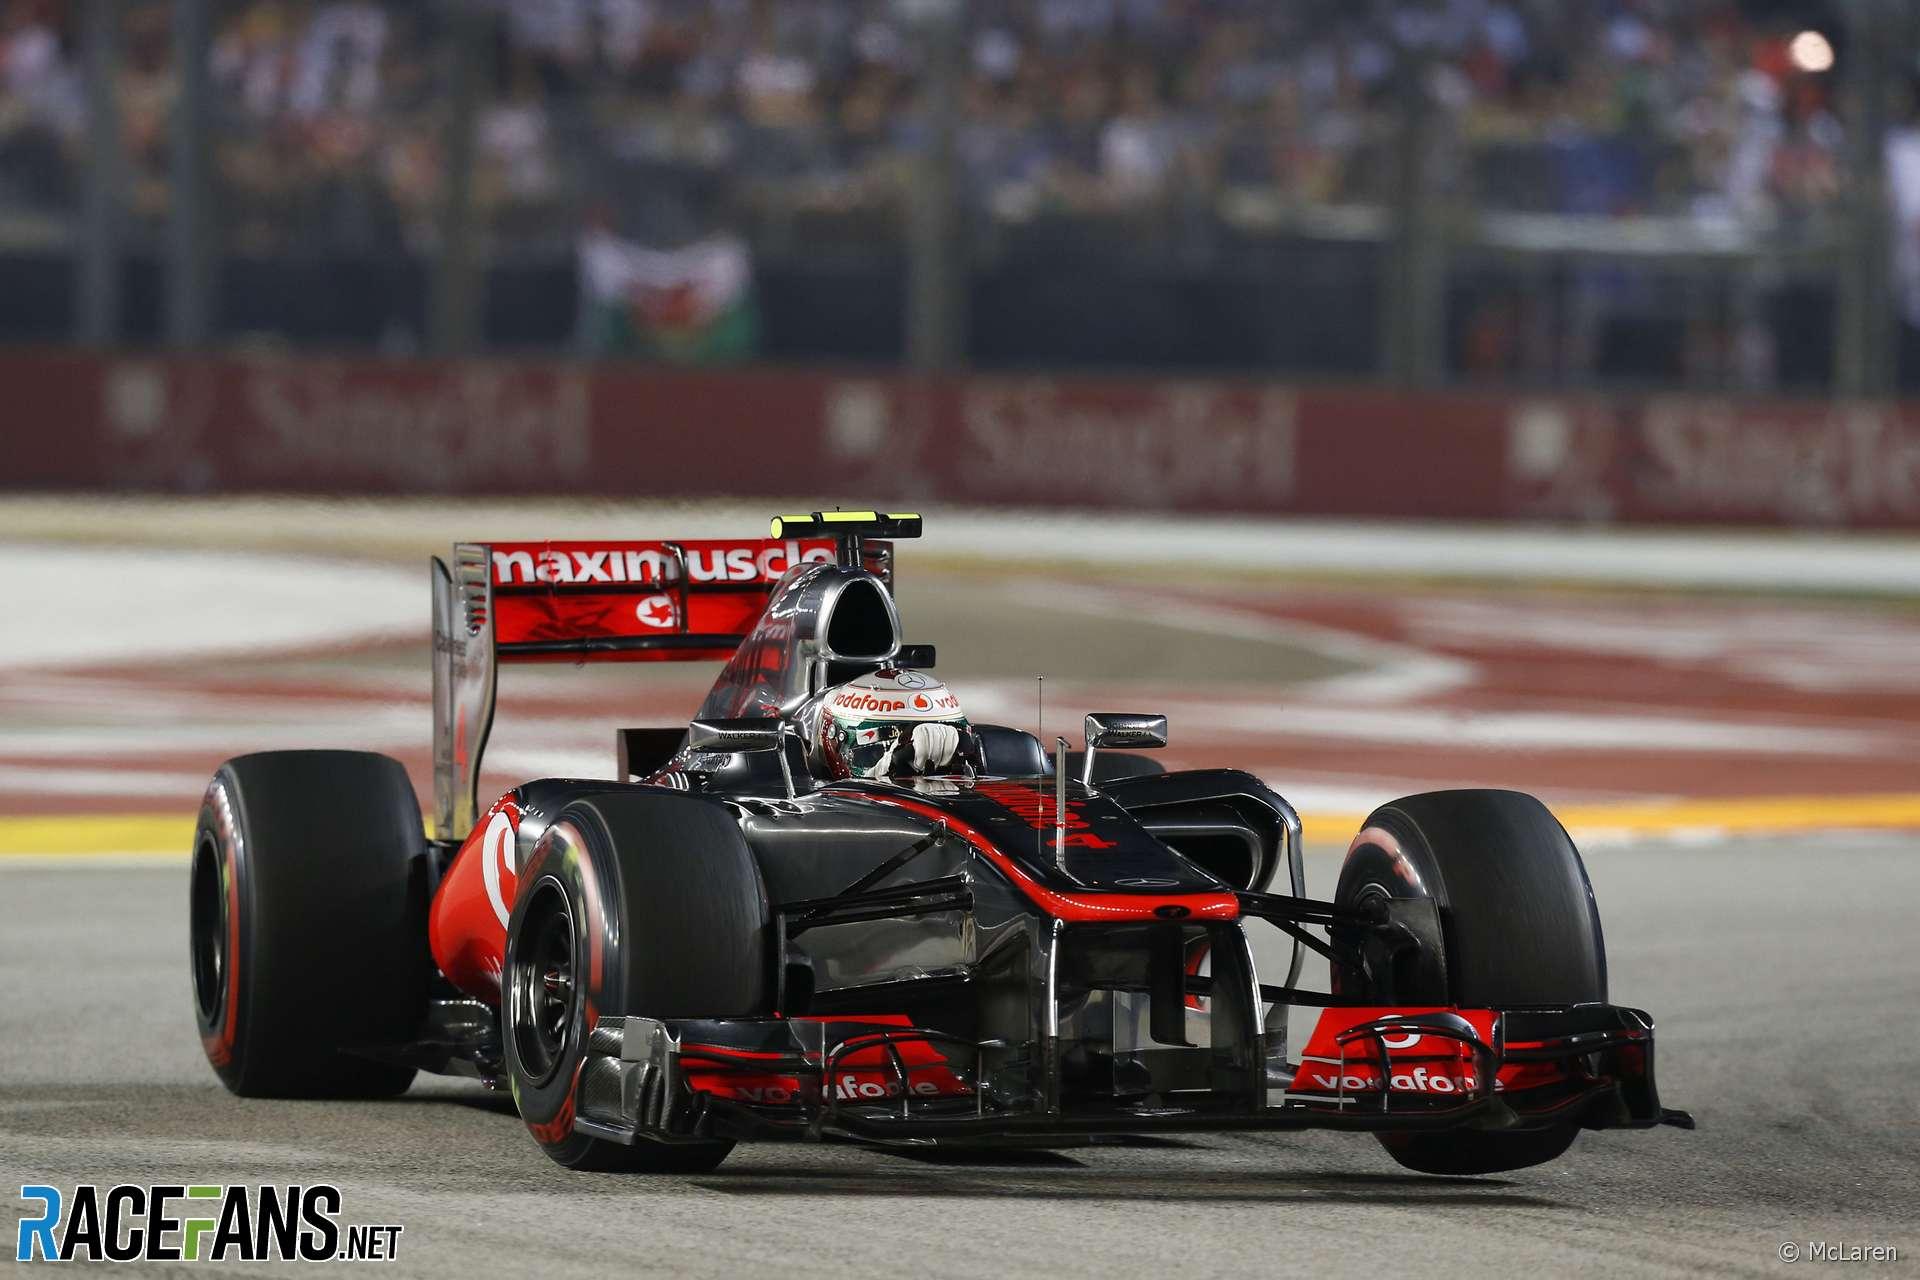 Lewis Hamilton, McLaren, Singapore, 2012